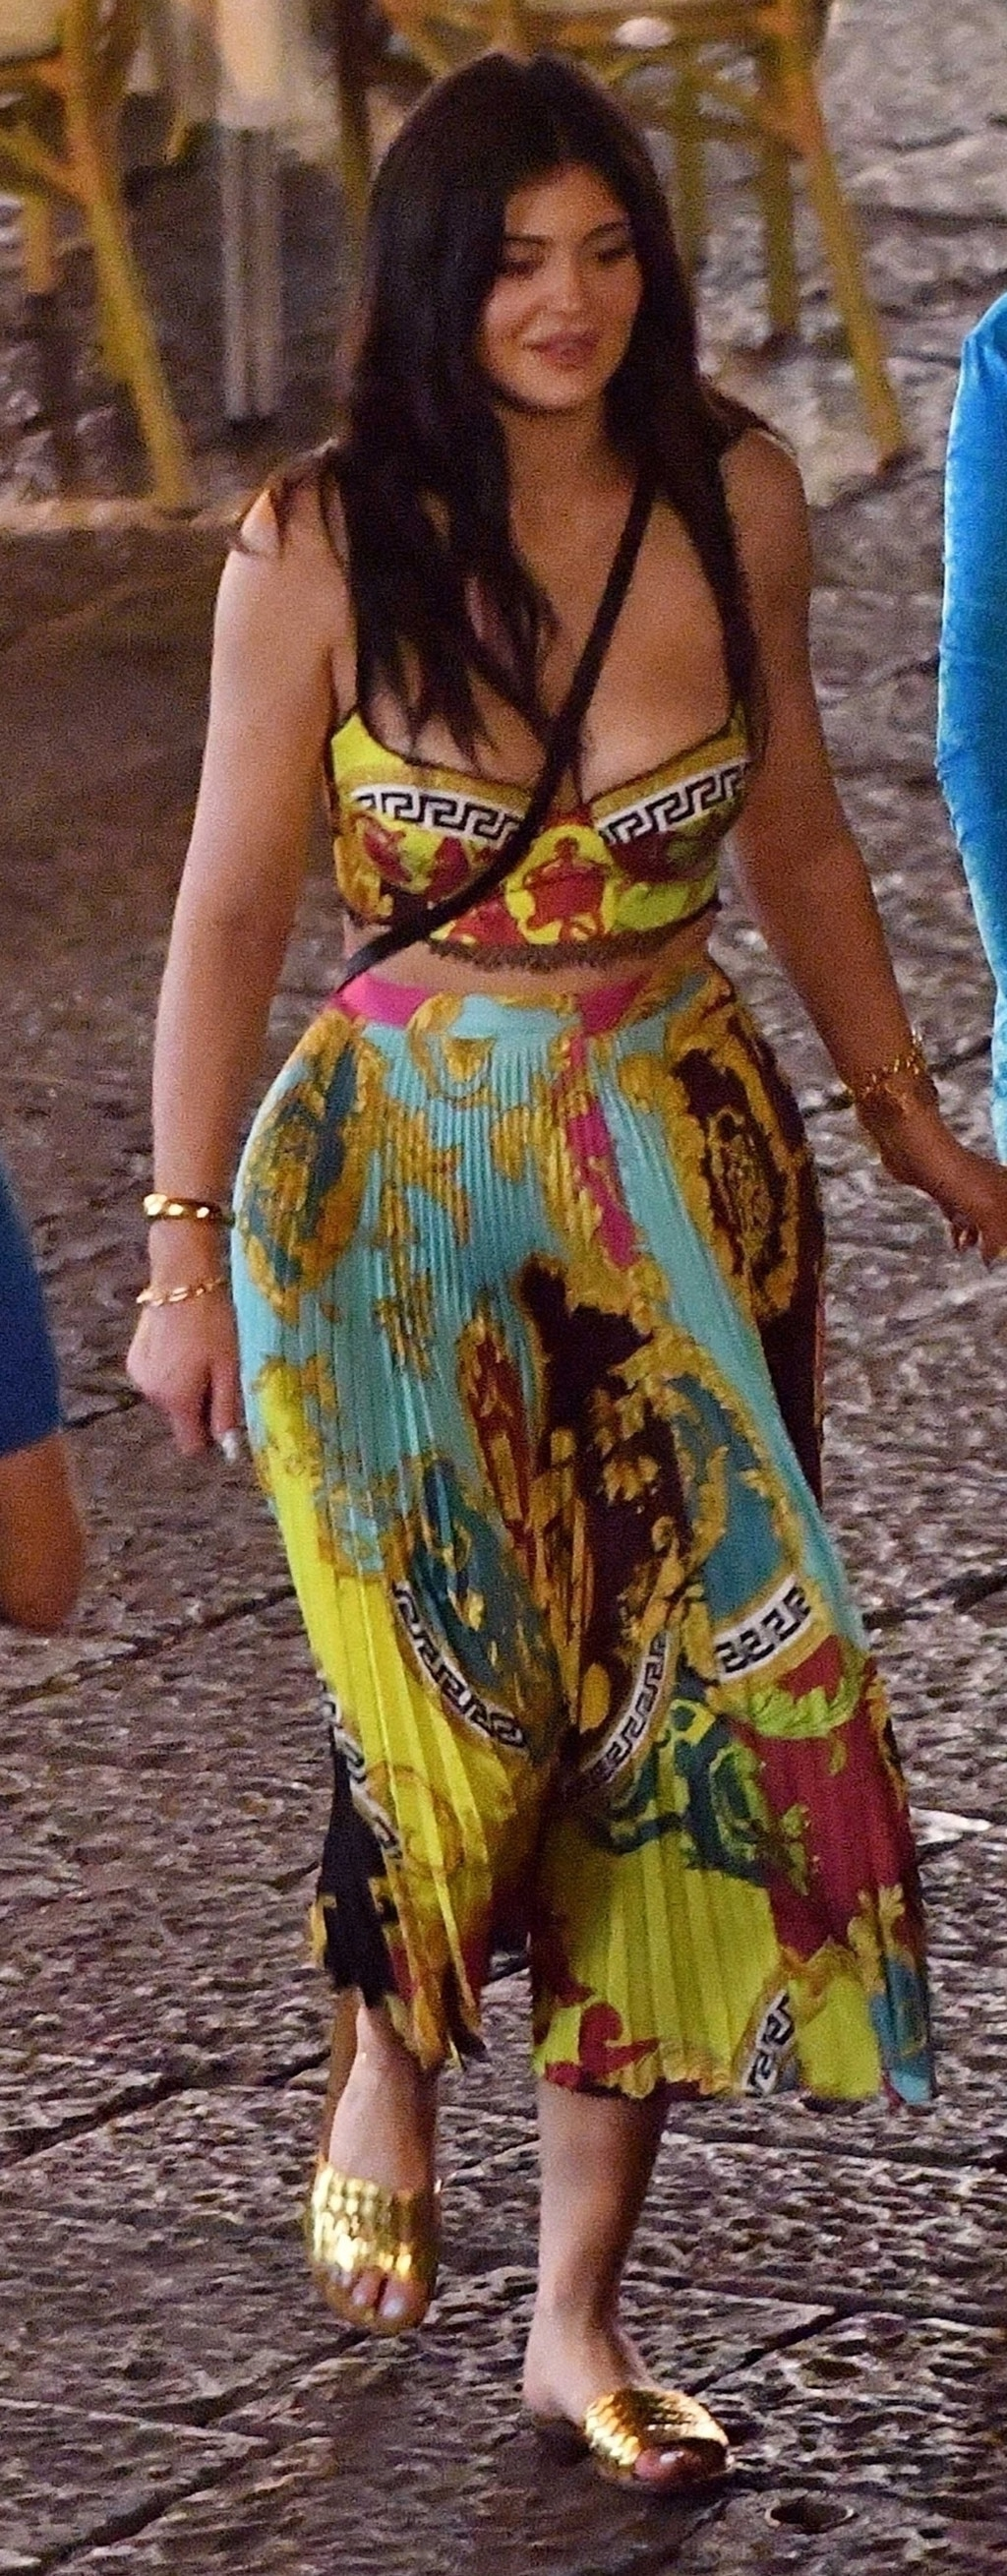 Kylie Jenner, Italy, Kylie Jenner's wardrobe